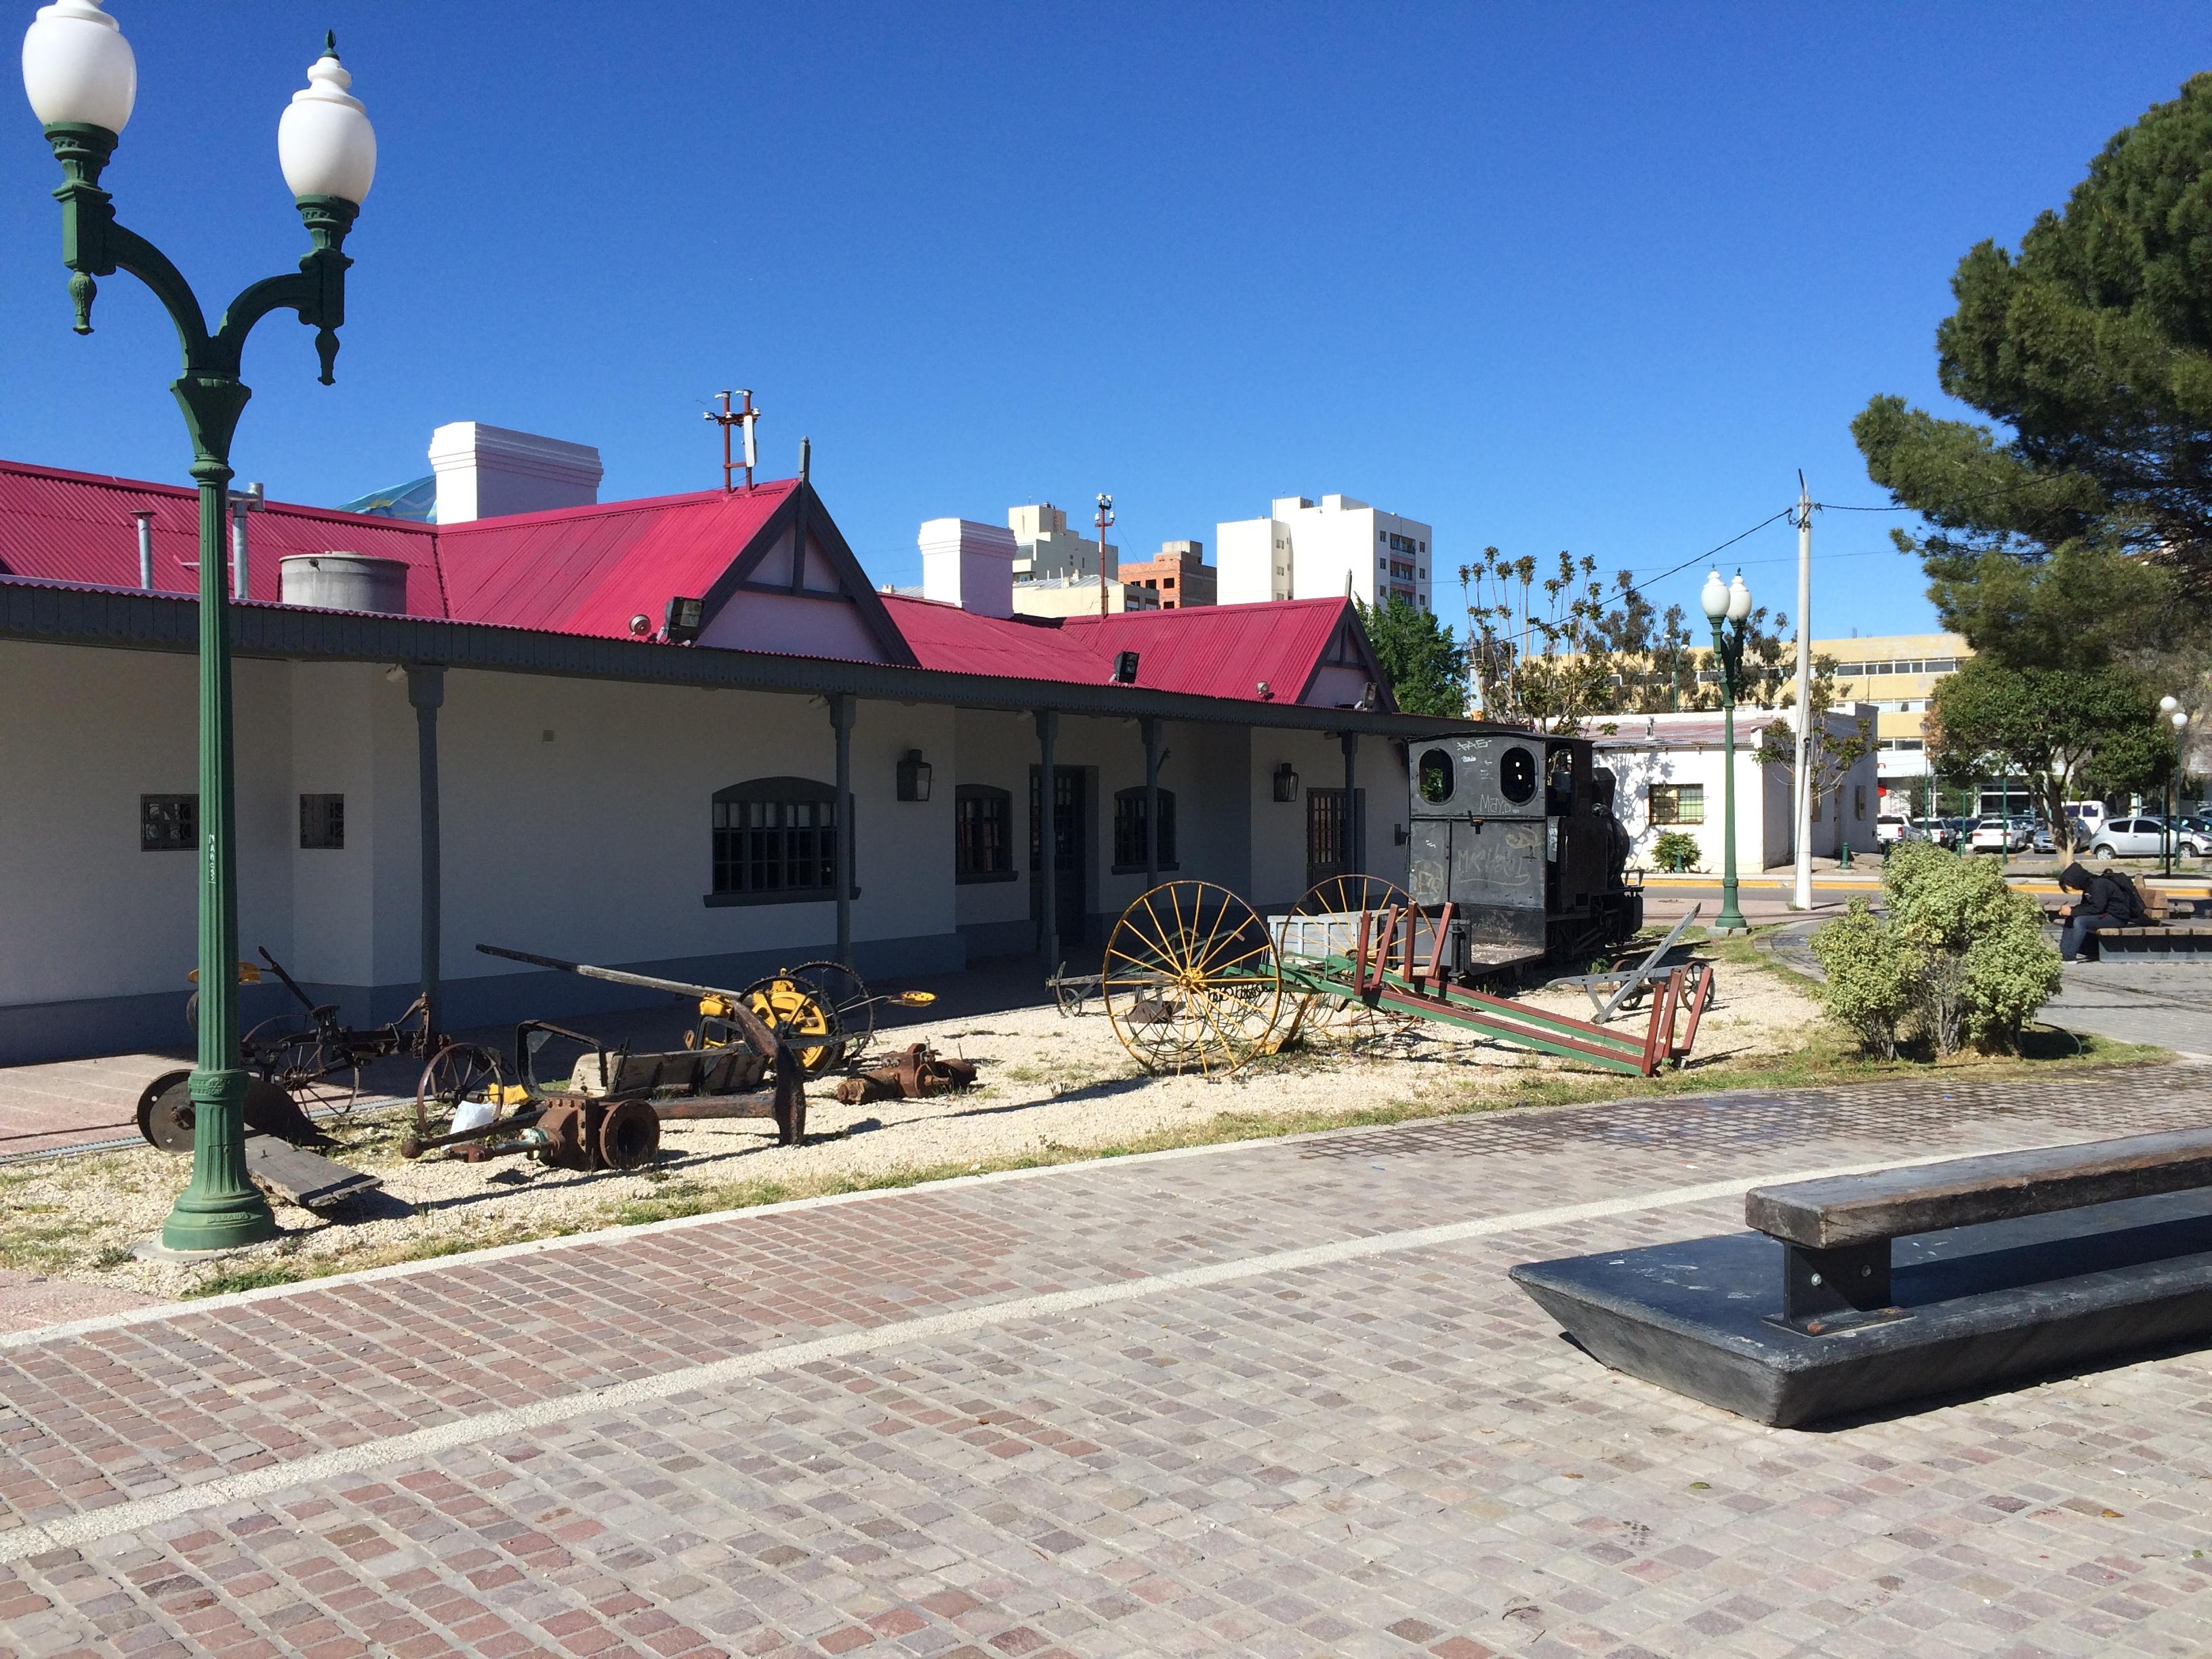 Pueblo de Luis Museum, Trelew